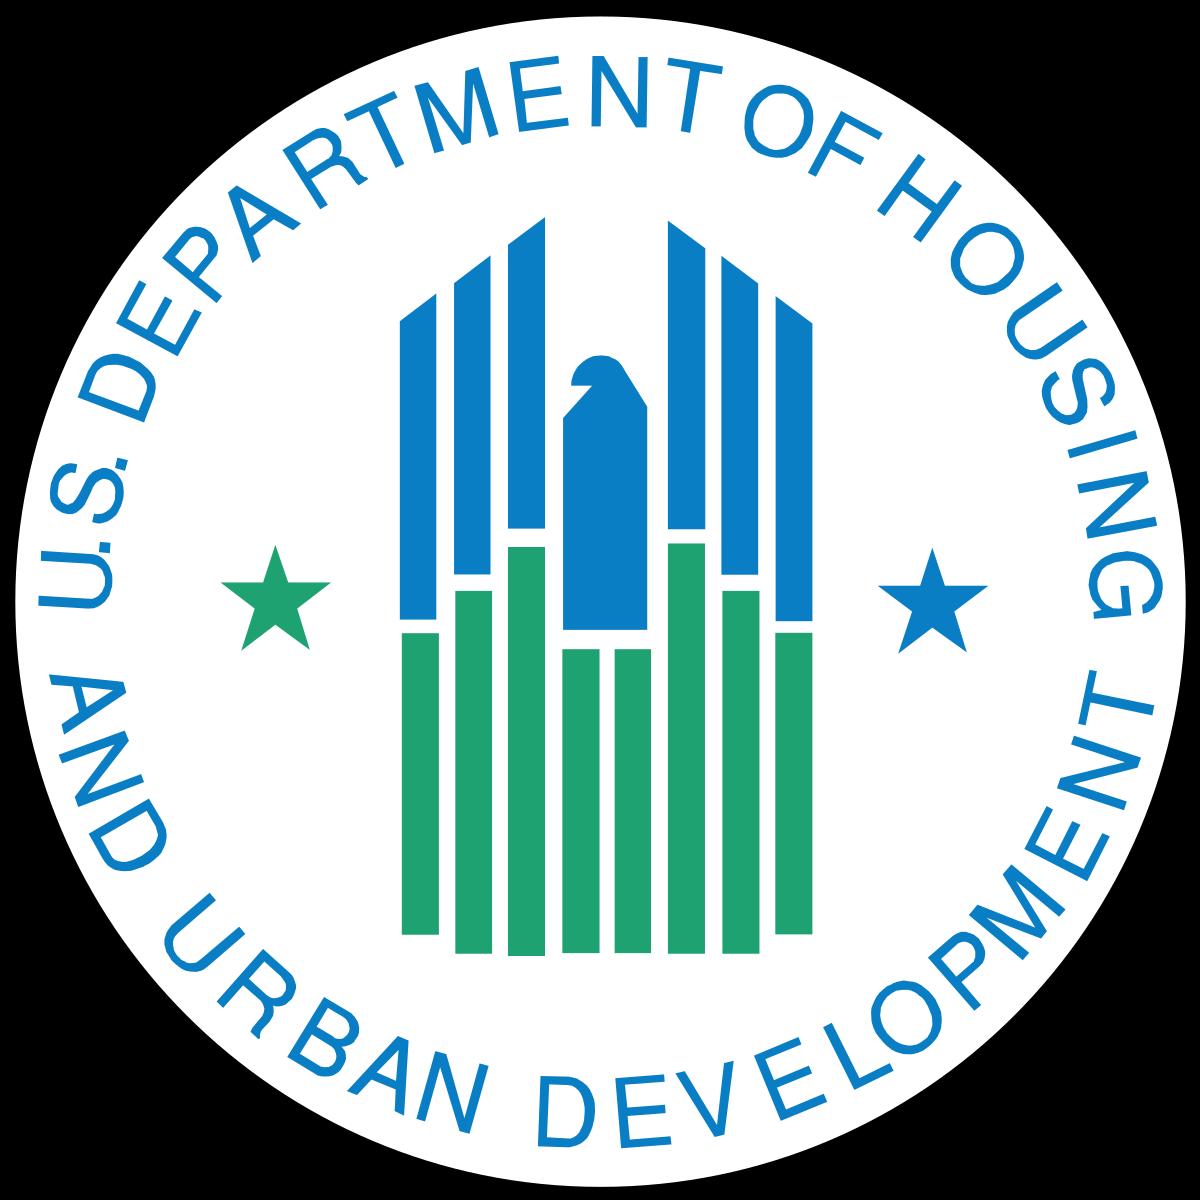 https://anysizedealsweek.com/wp-content/uploads/2020/07/HUD-Logo.png